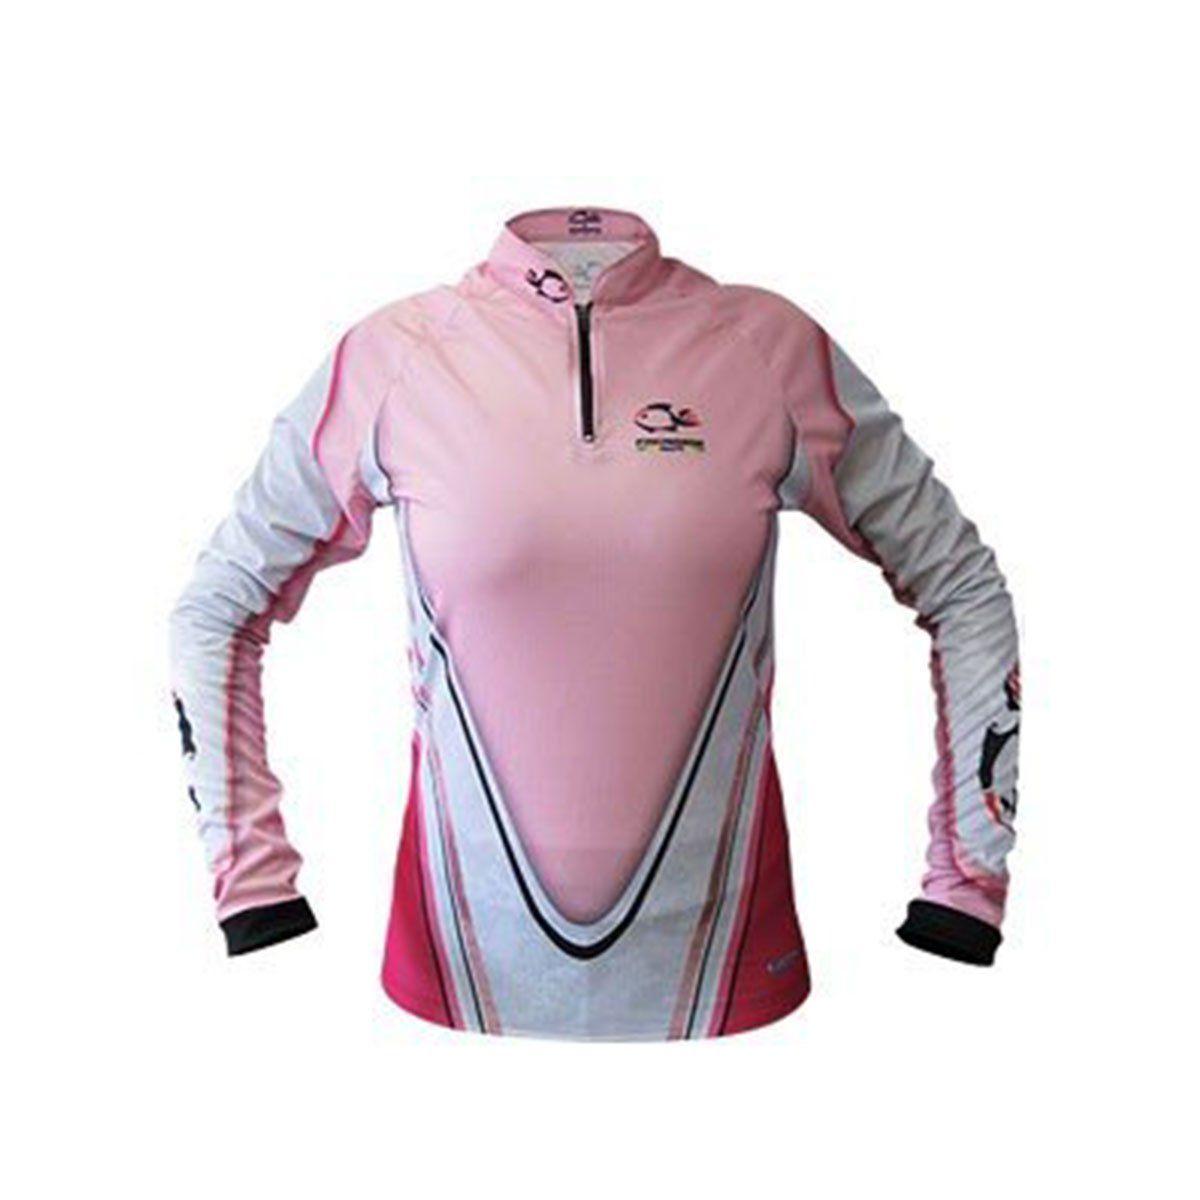 Camisa Faca na Rede Girl - NC 25